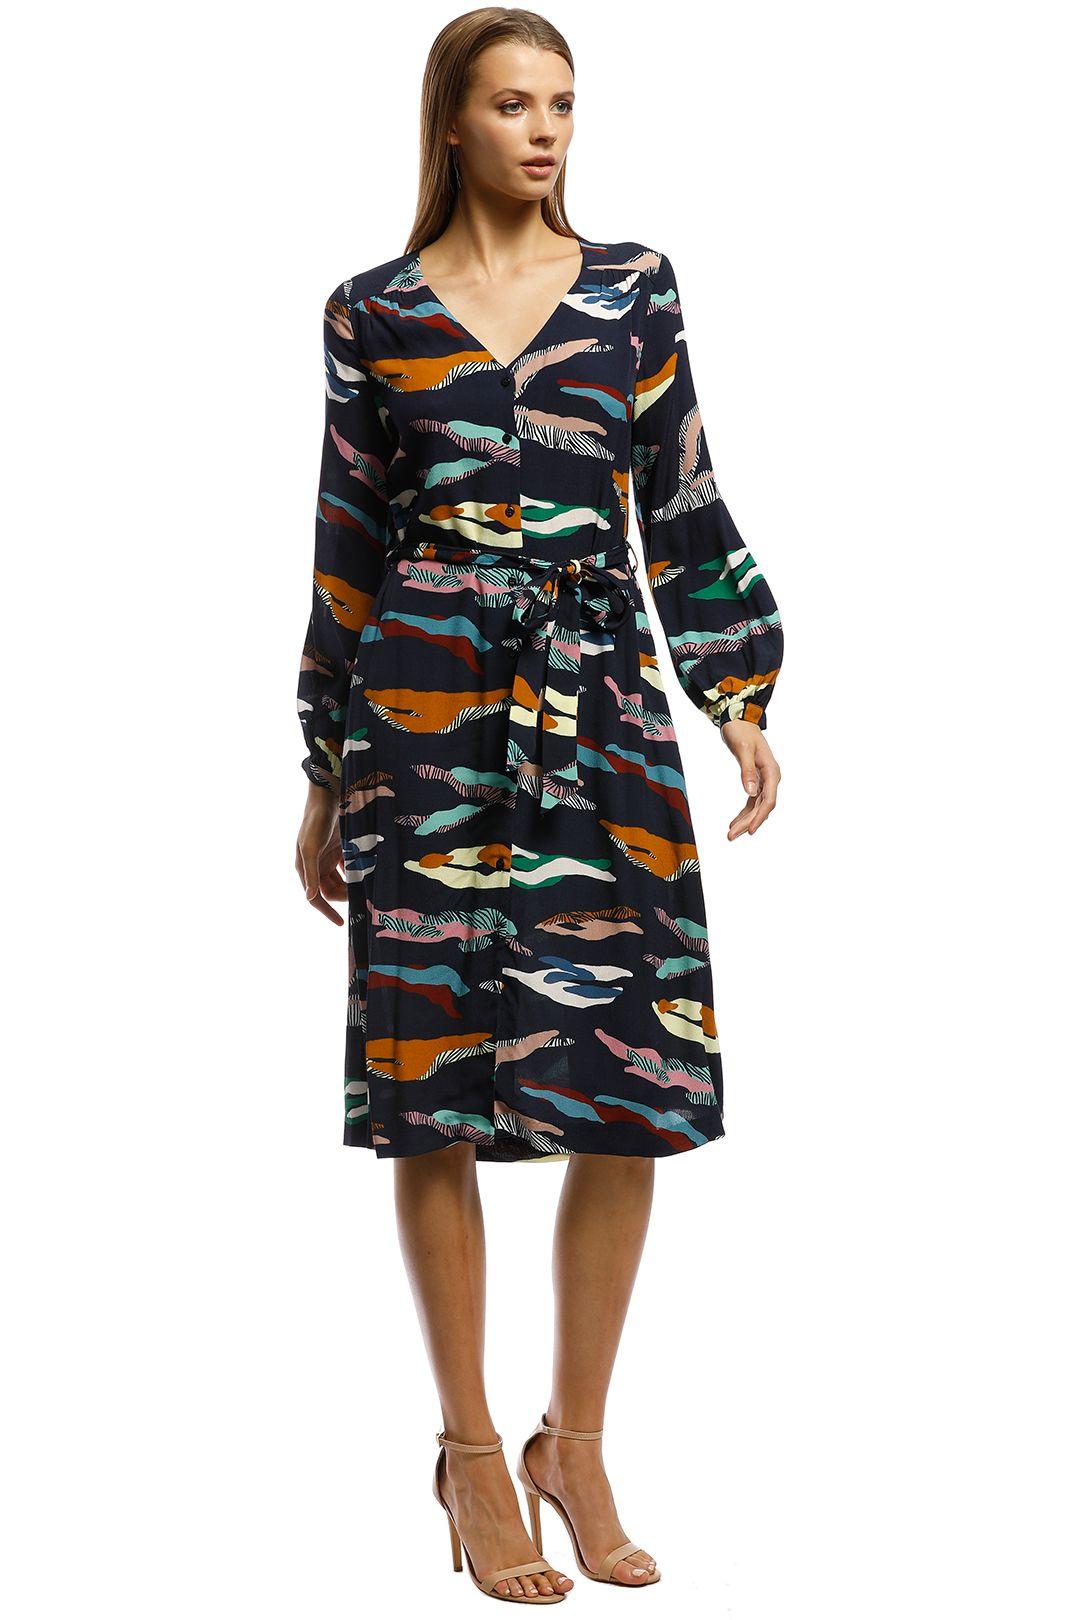 Gorman - Tora Dress - Blue print - Side